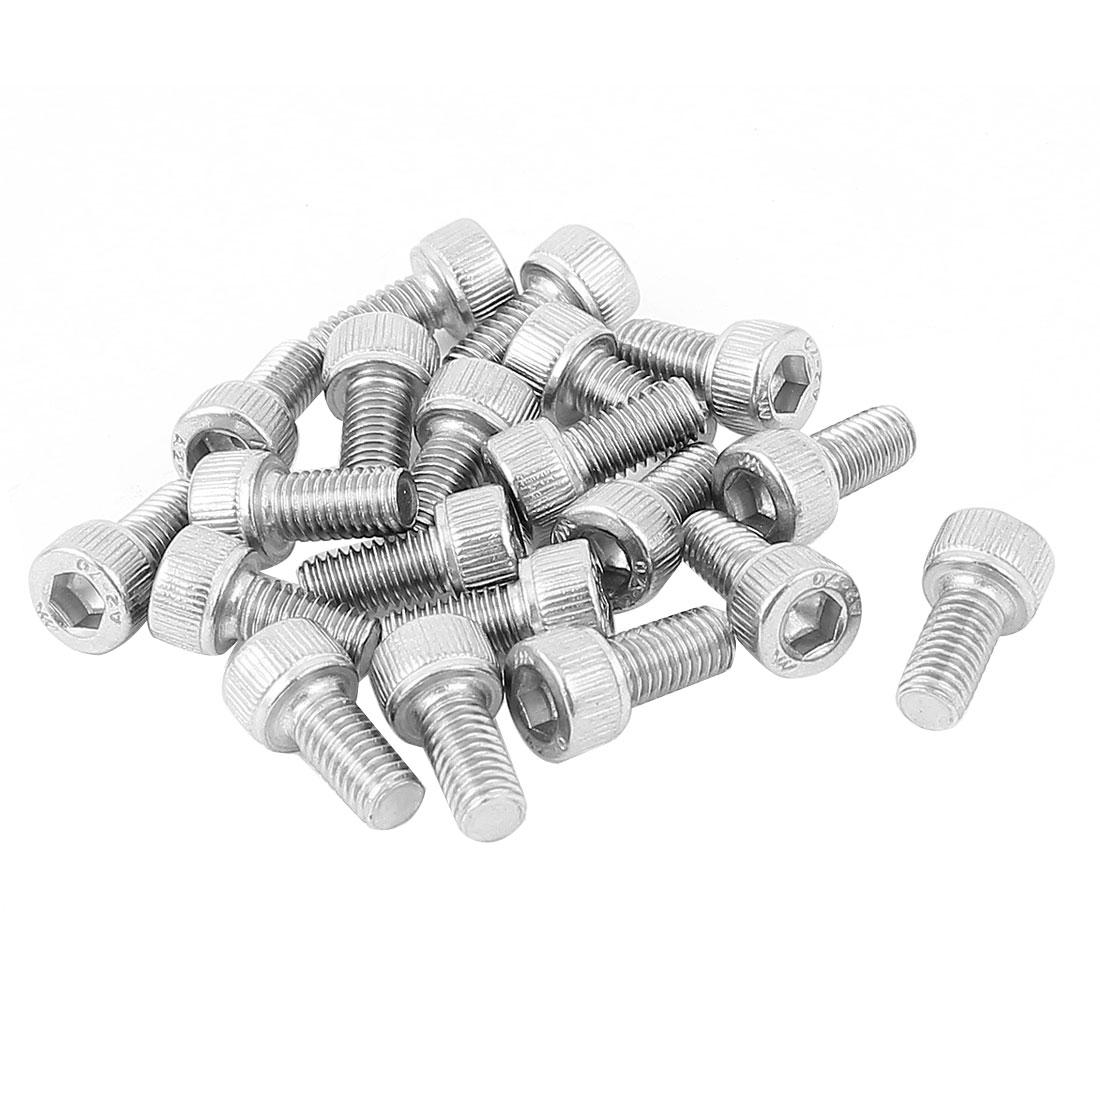 M5x10mm Thread 304 Stainless Steel Hex Key Bolt Socket Head Cap Screws 20pcs